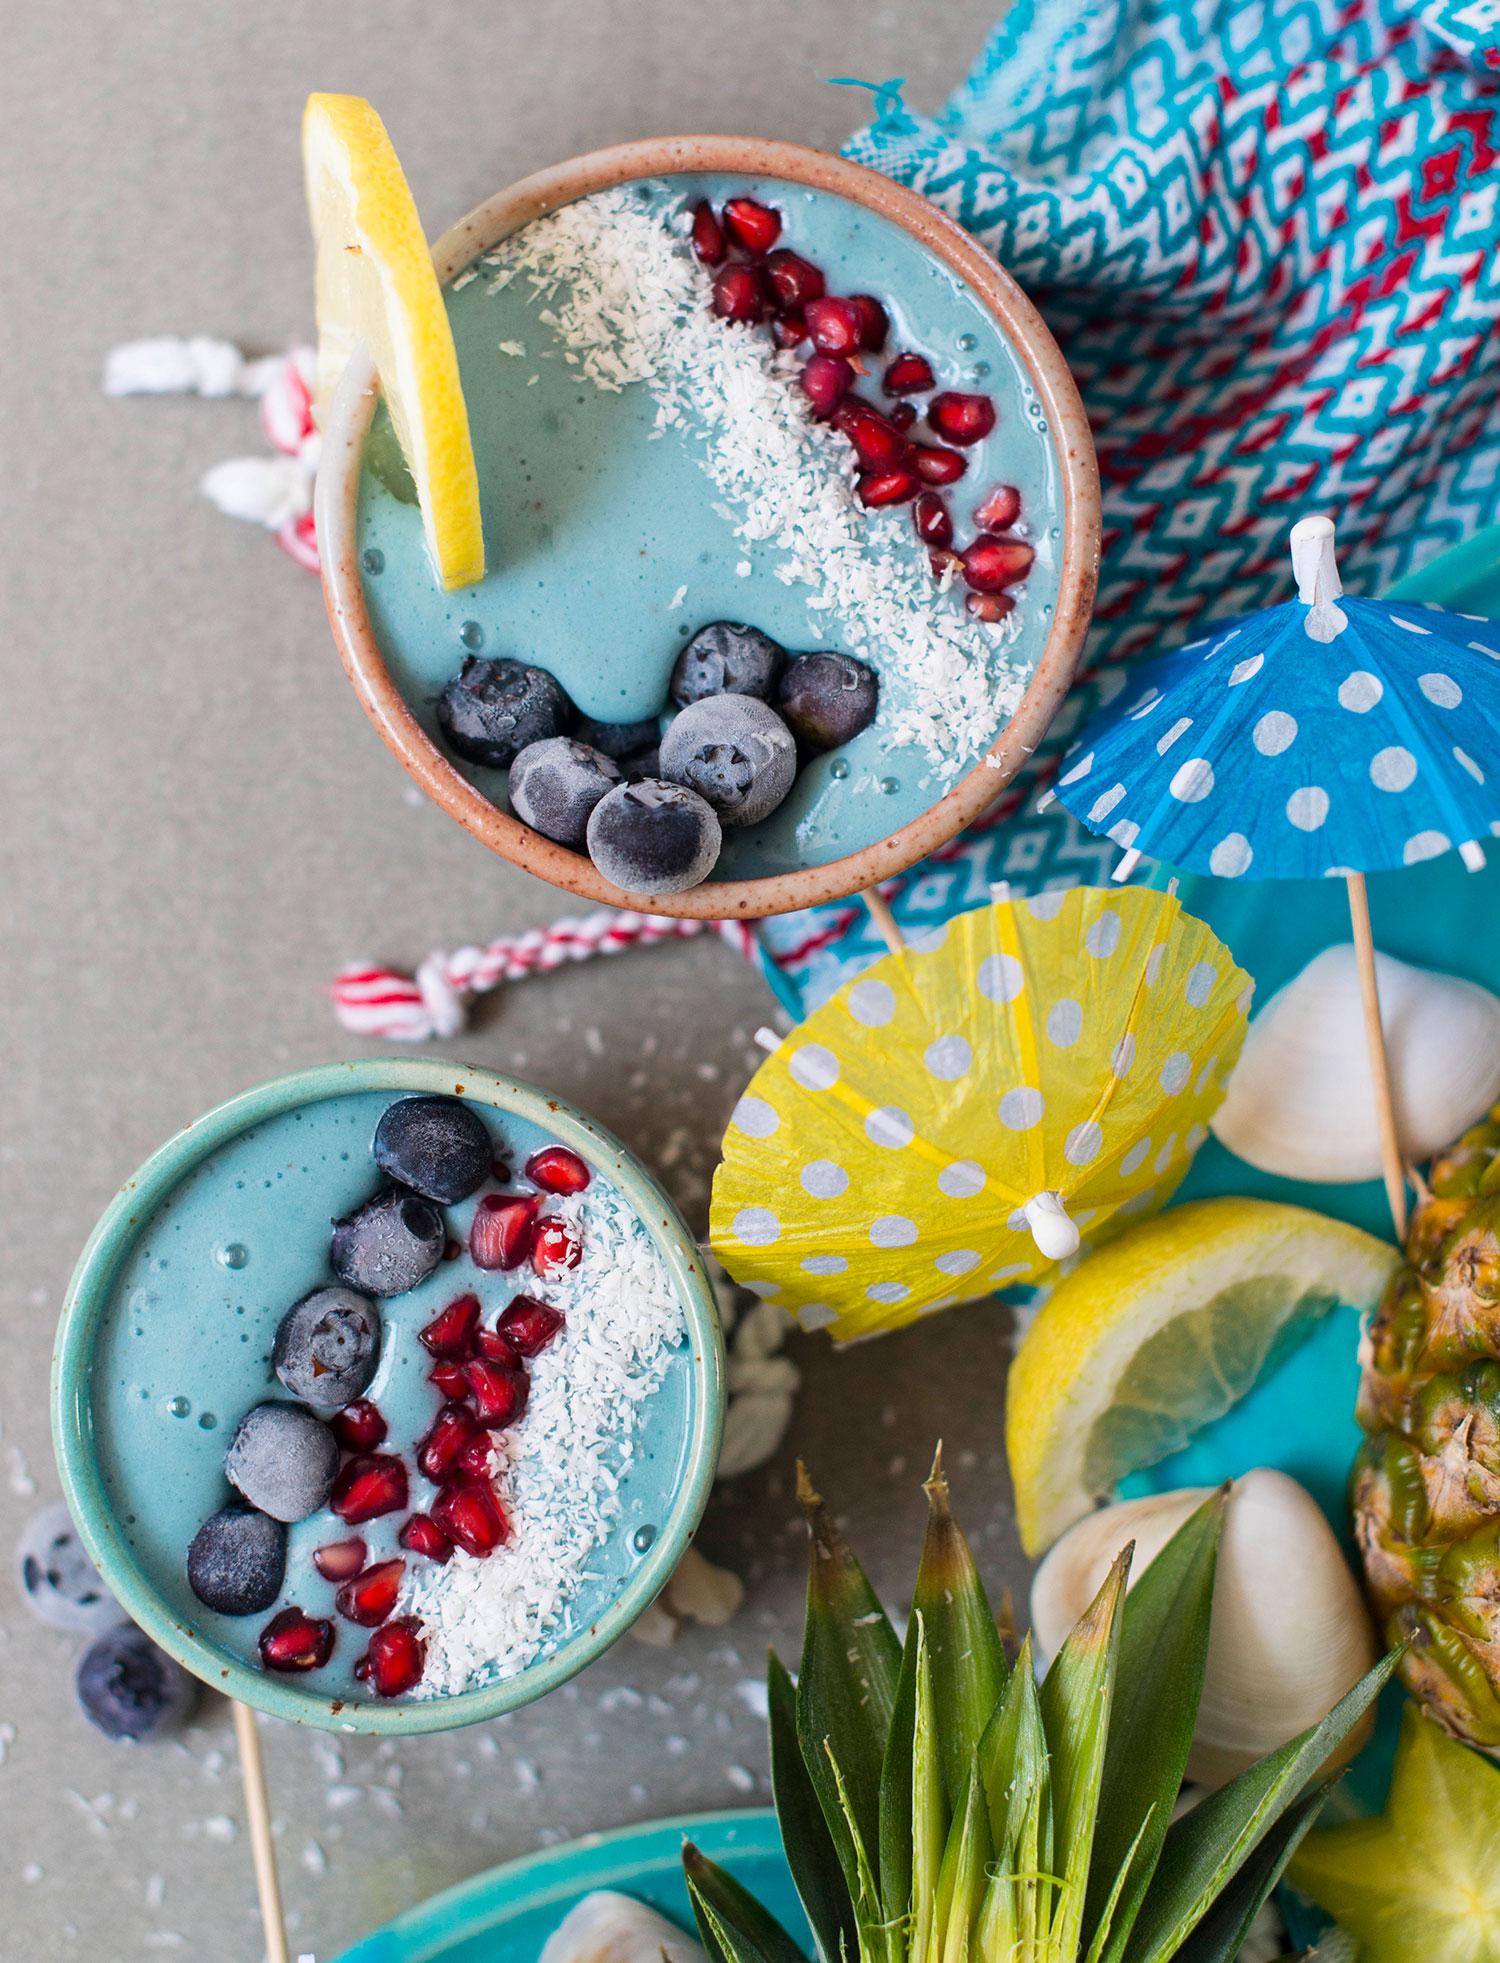 Veganz_Protein-Shake-Aqua-Smoothie-Bowl-8